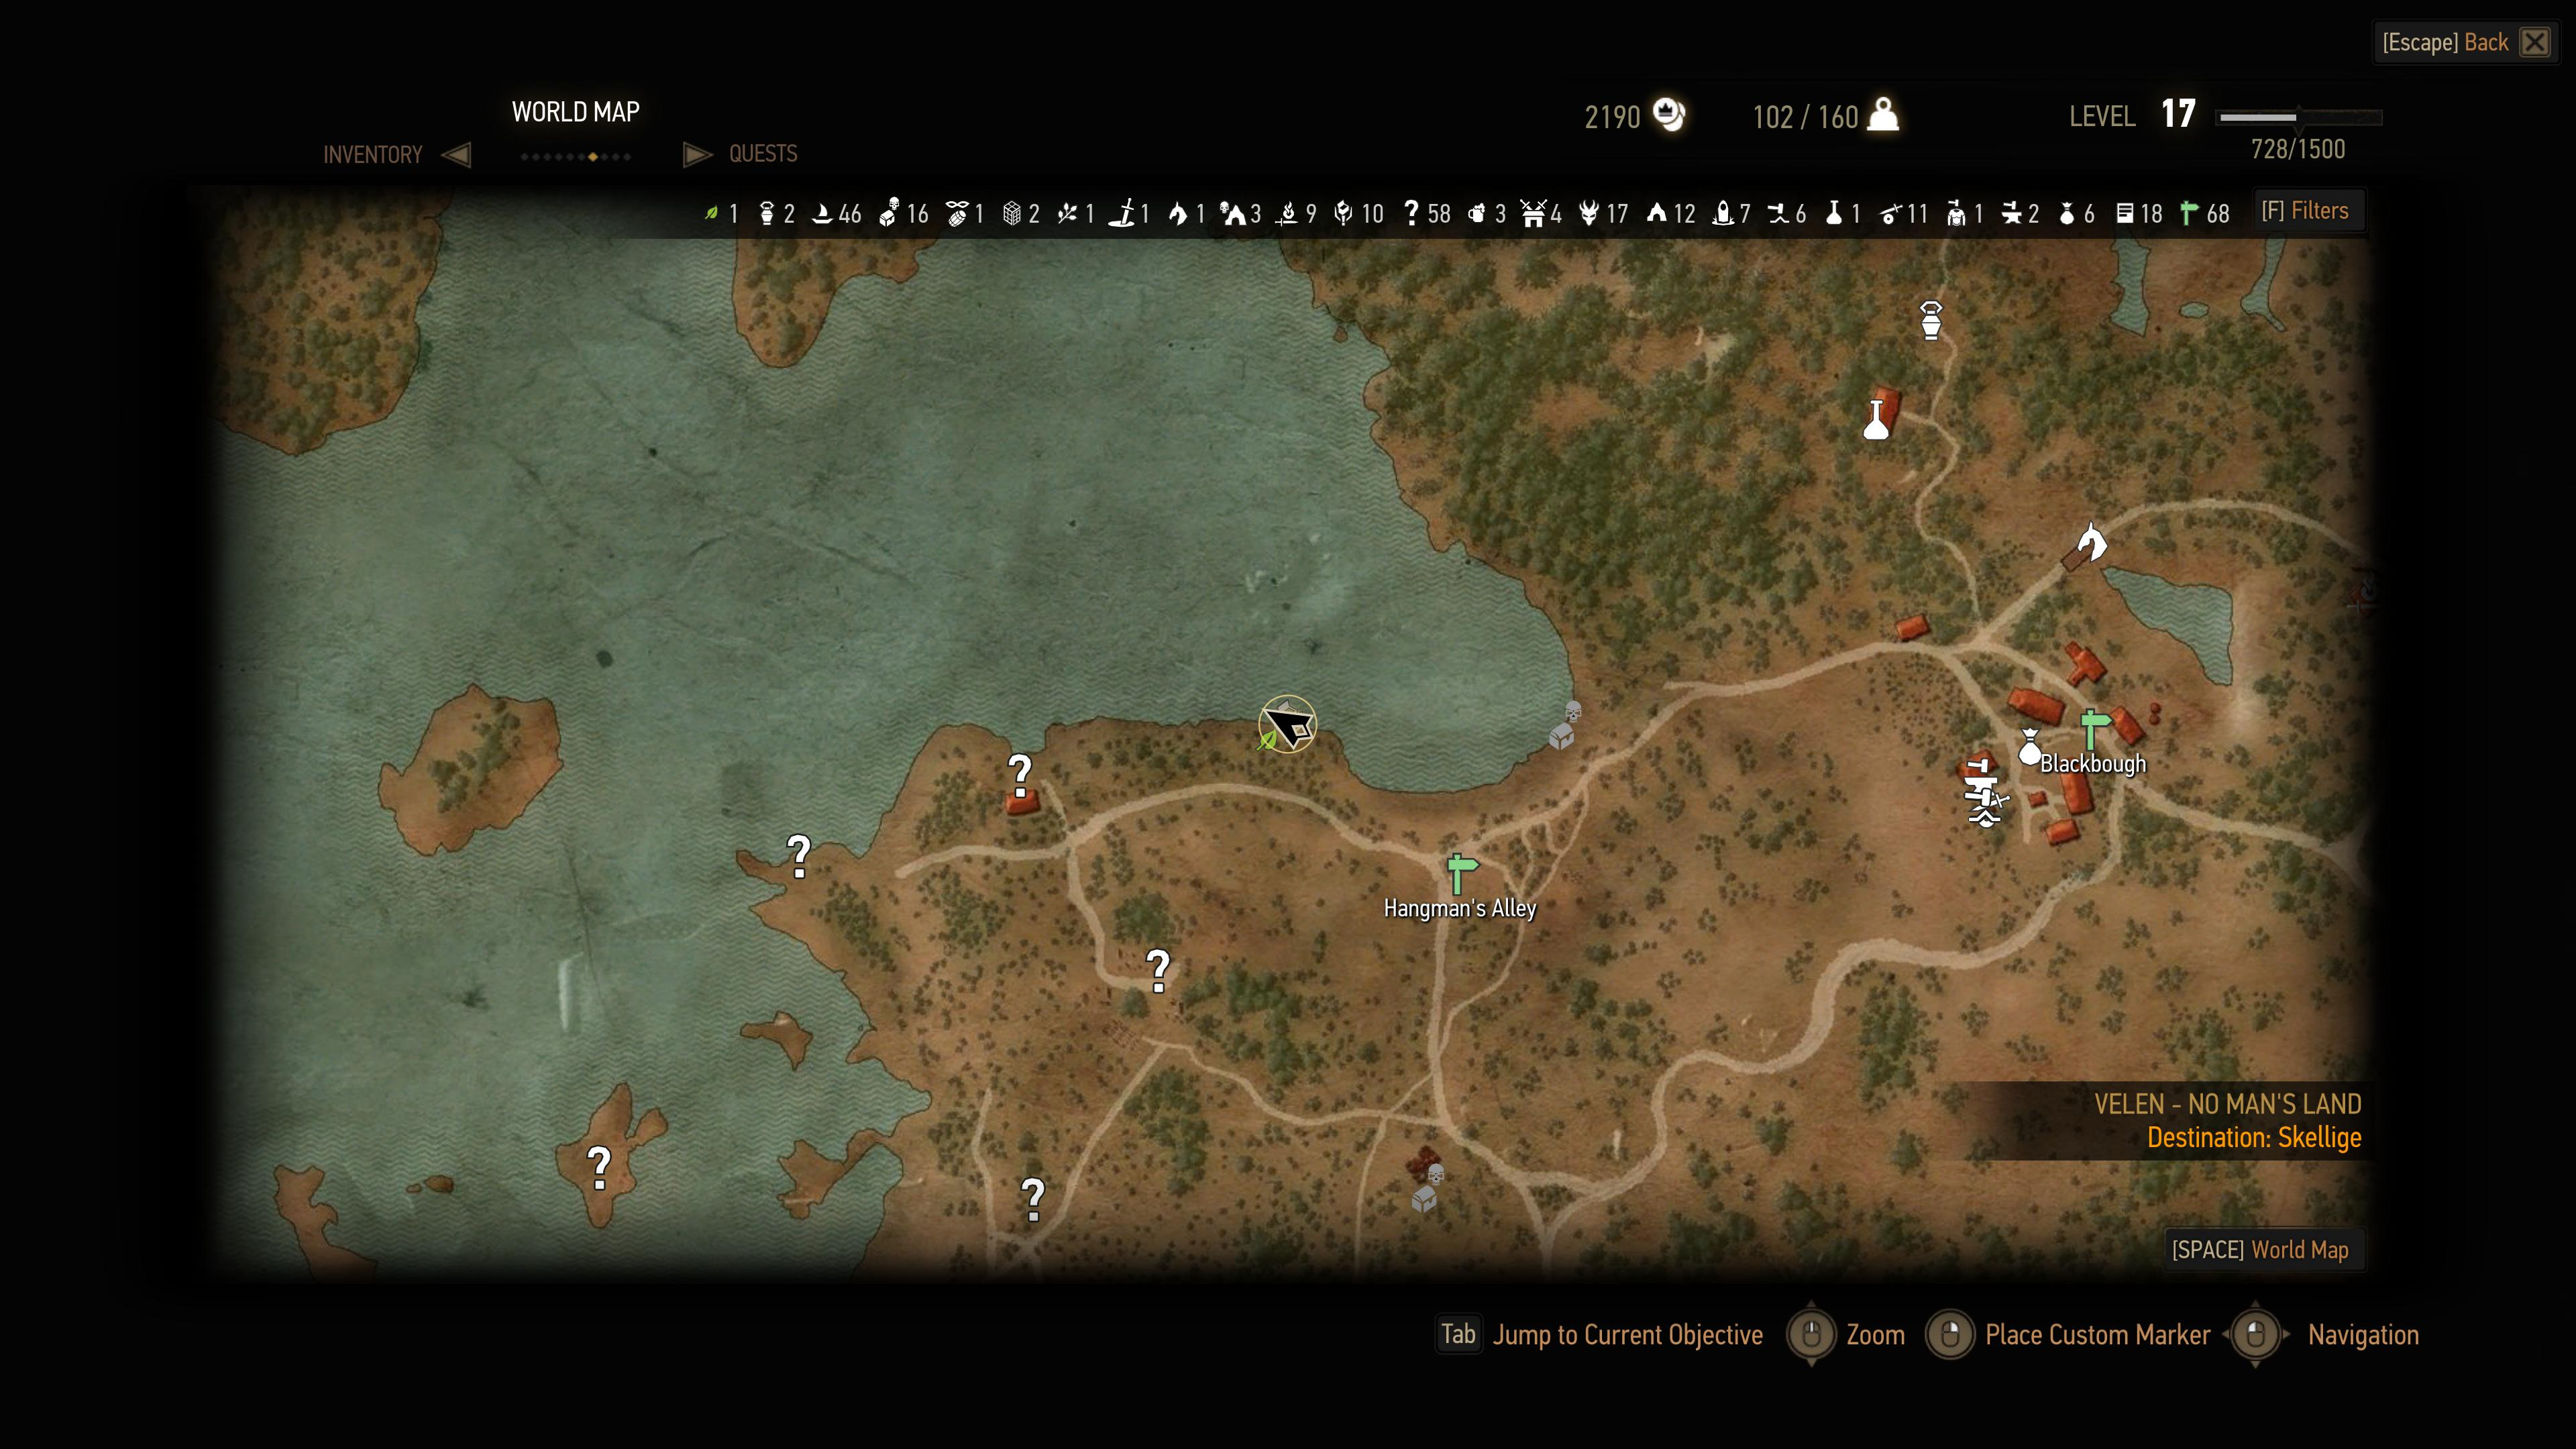 Tw3 map water-damaged letter.jpg